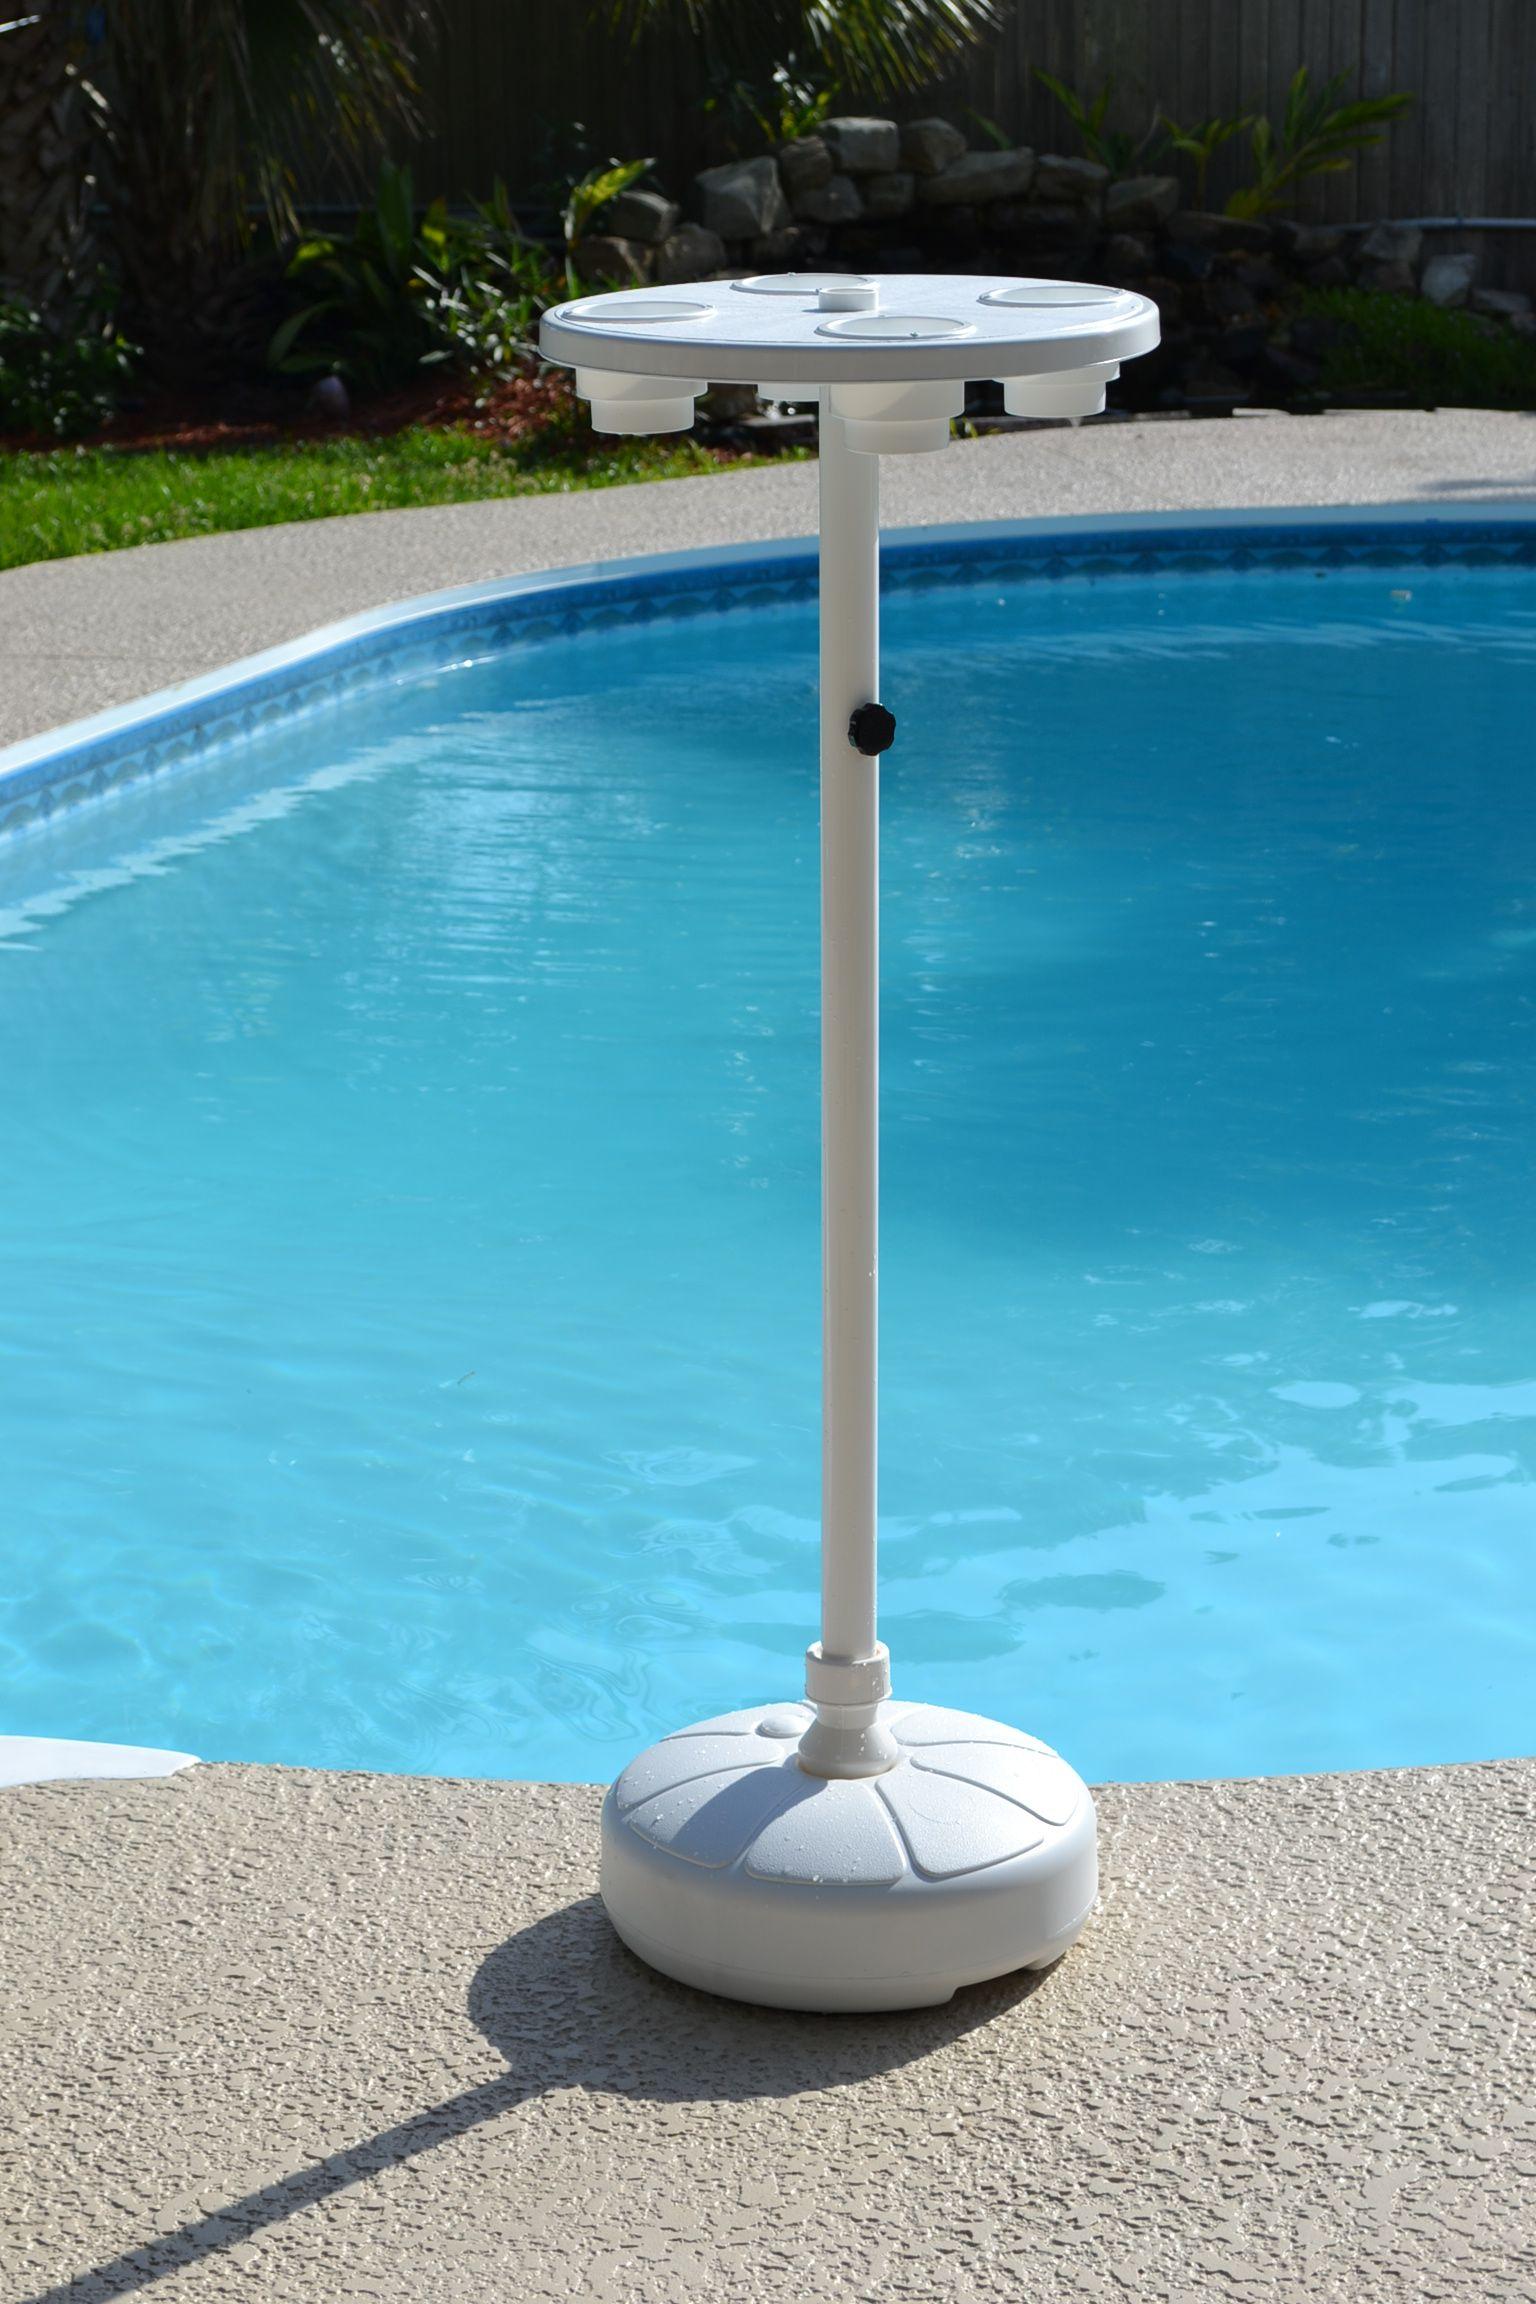 Pool and Patio Umbrella Table | SWIMMING POOL | Pinterest | Patio ...